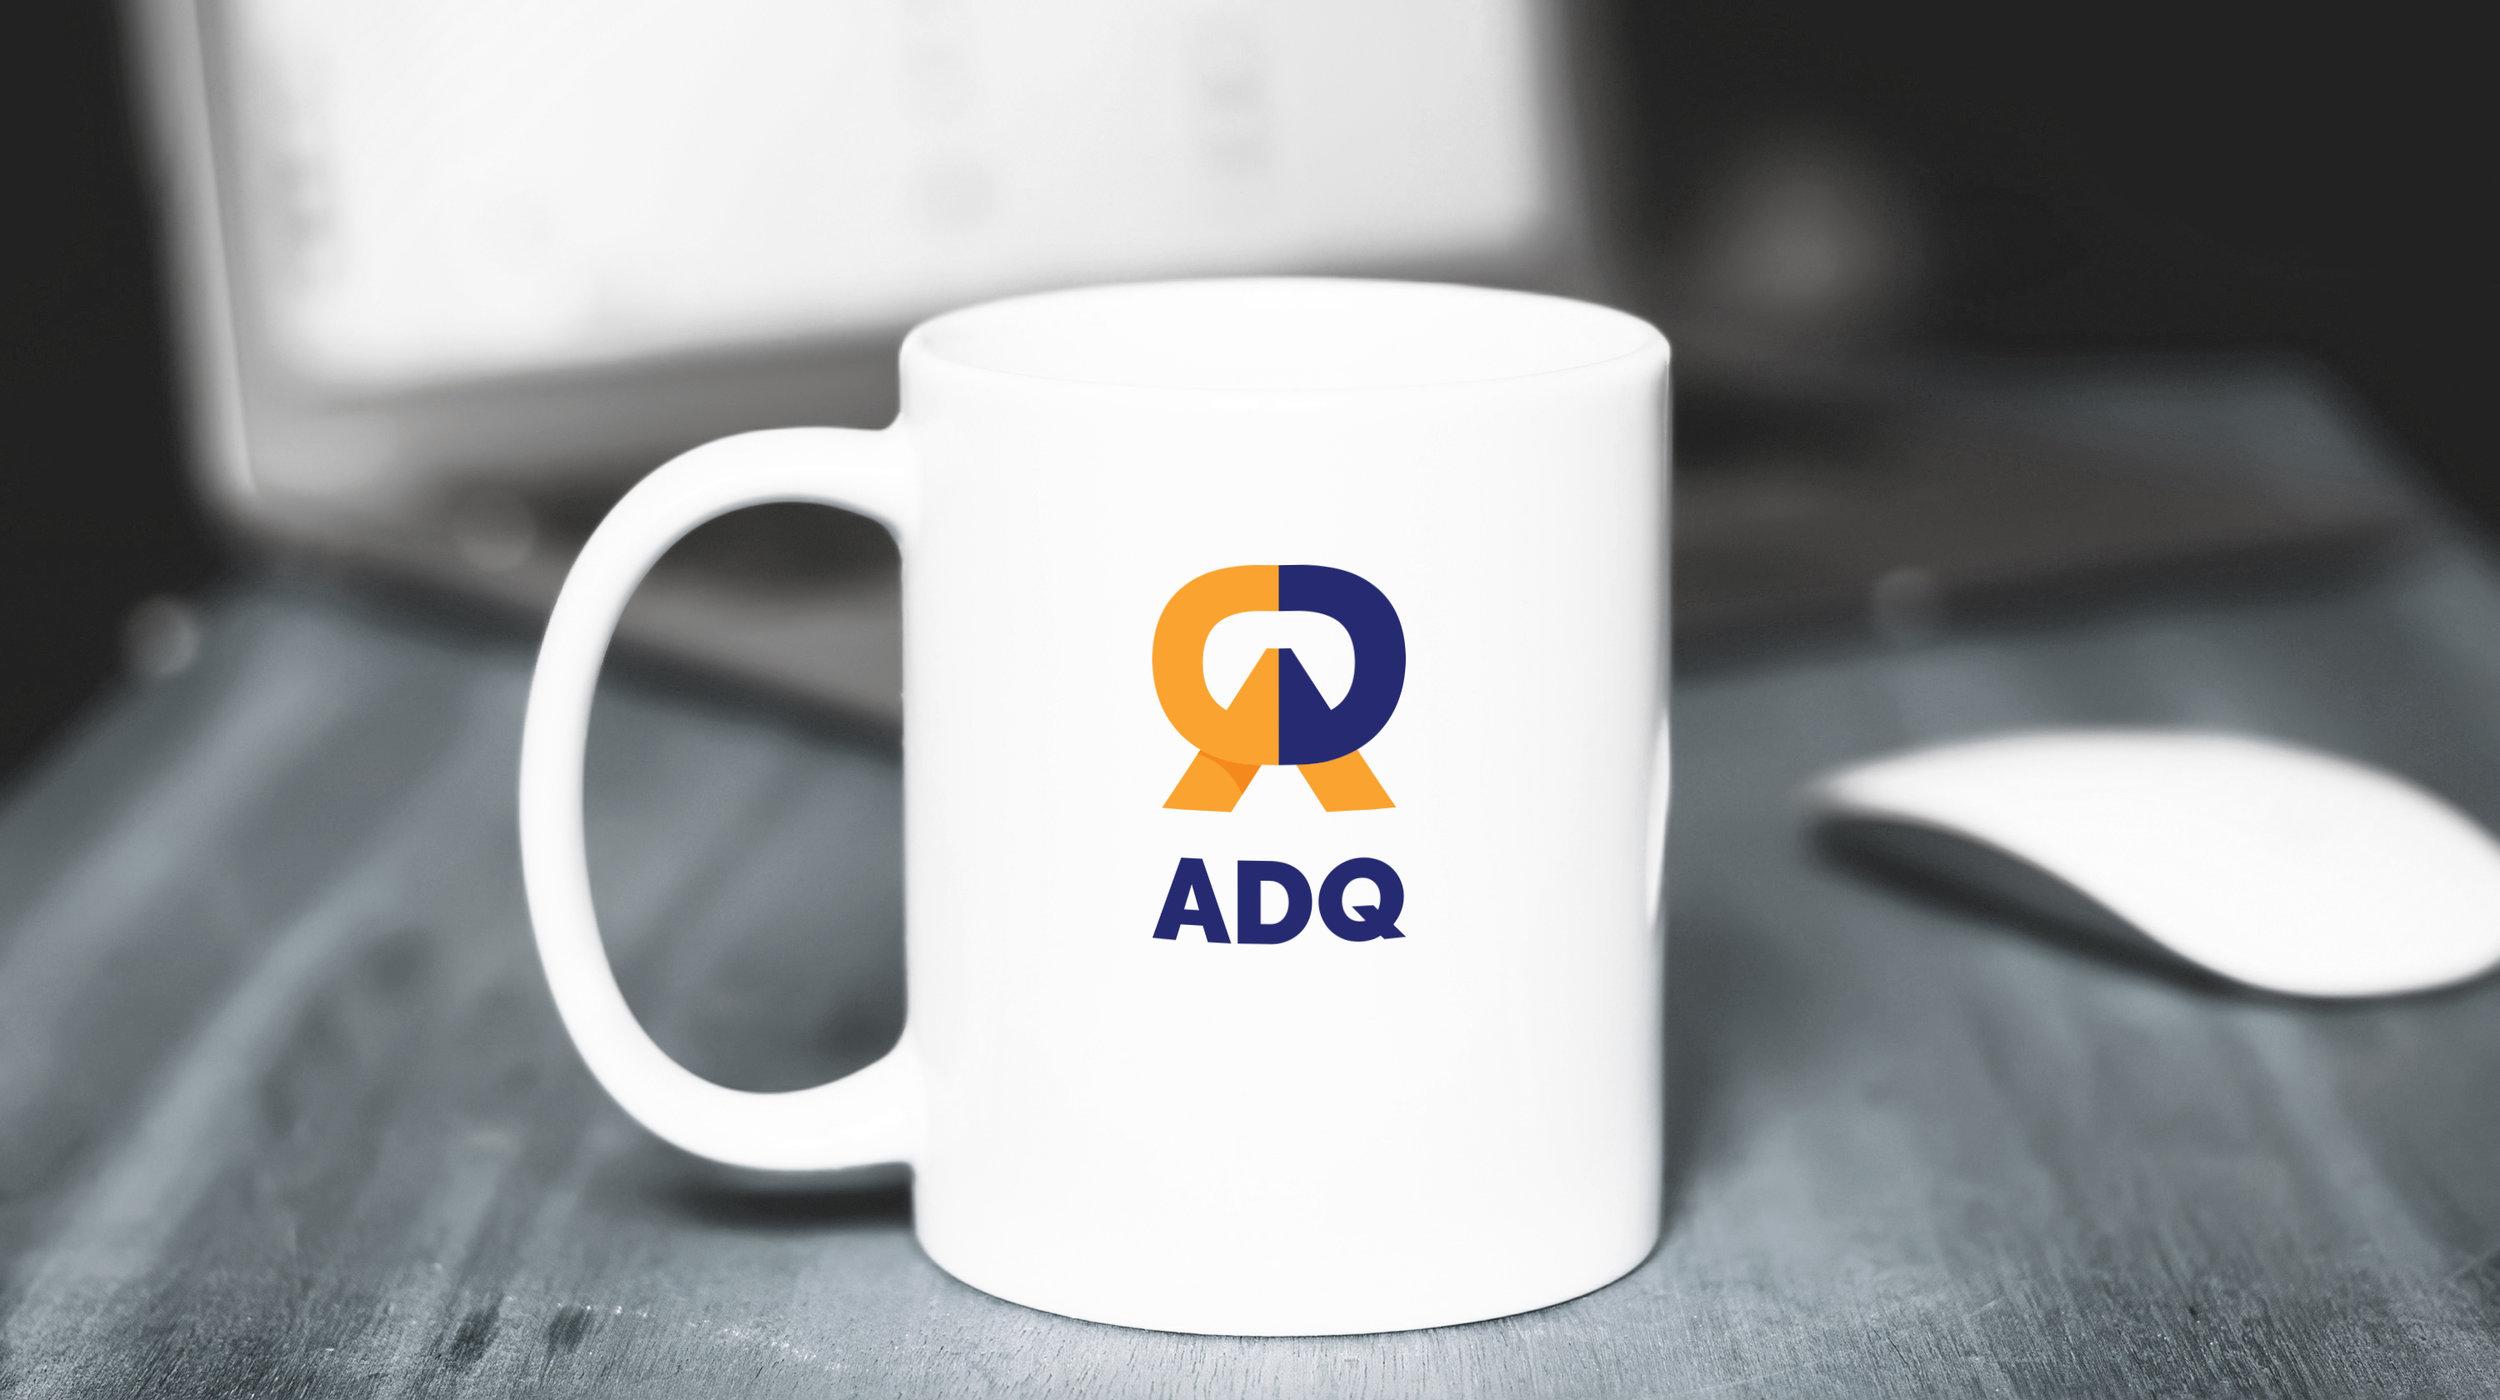 ADQ - Mug - Mockup.jpg